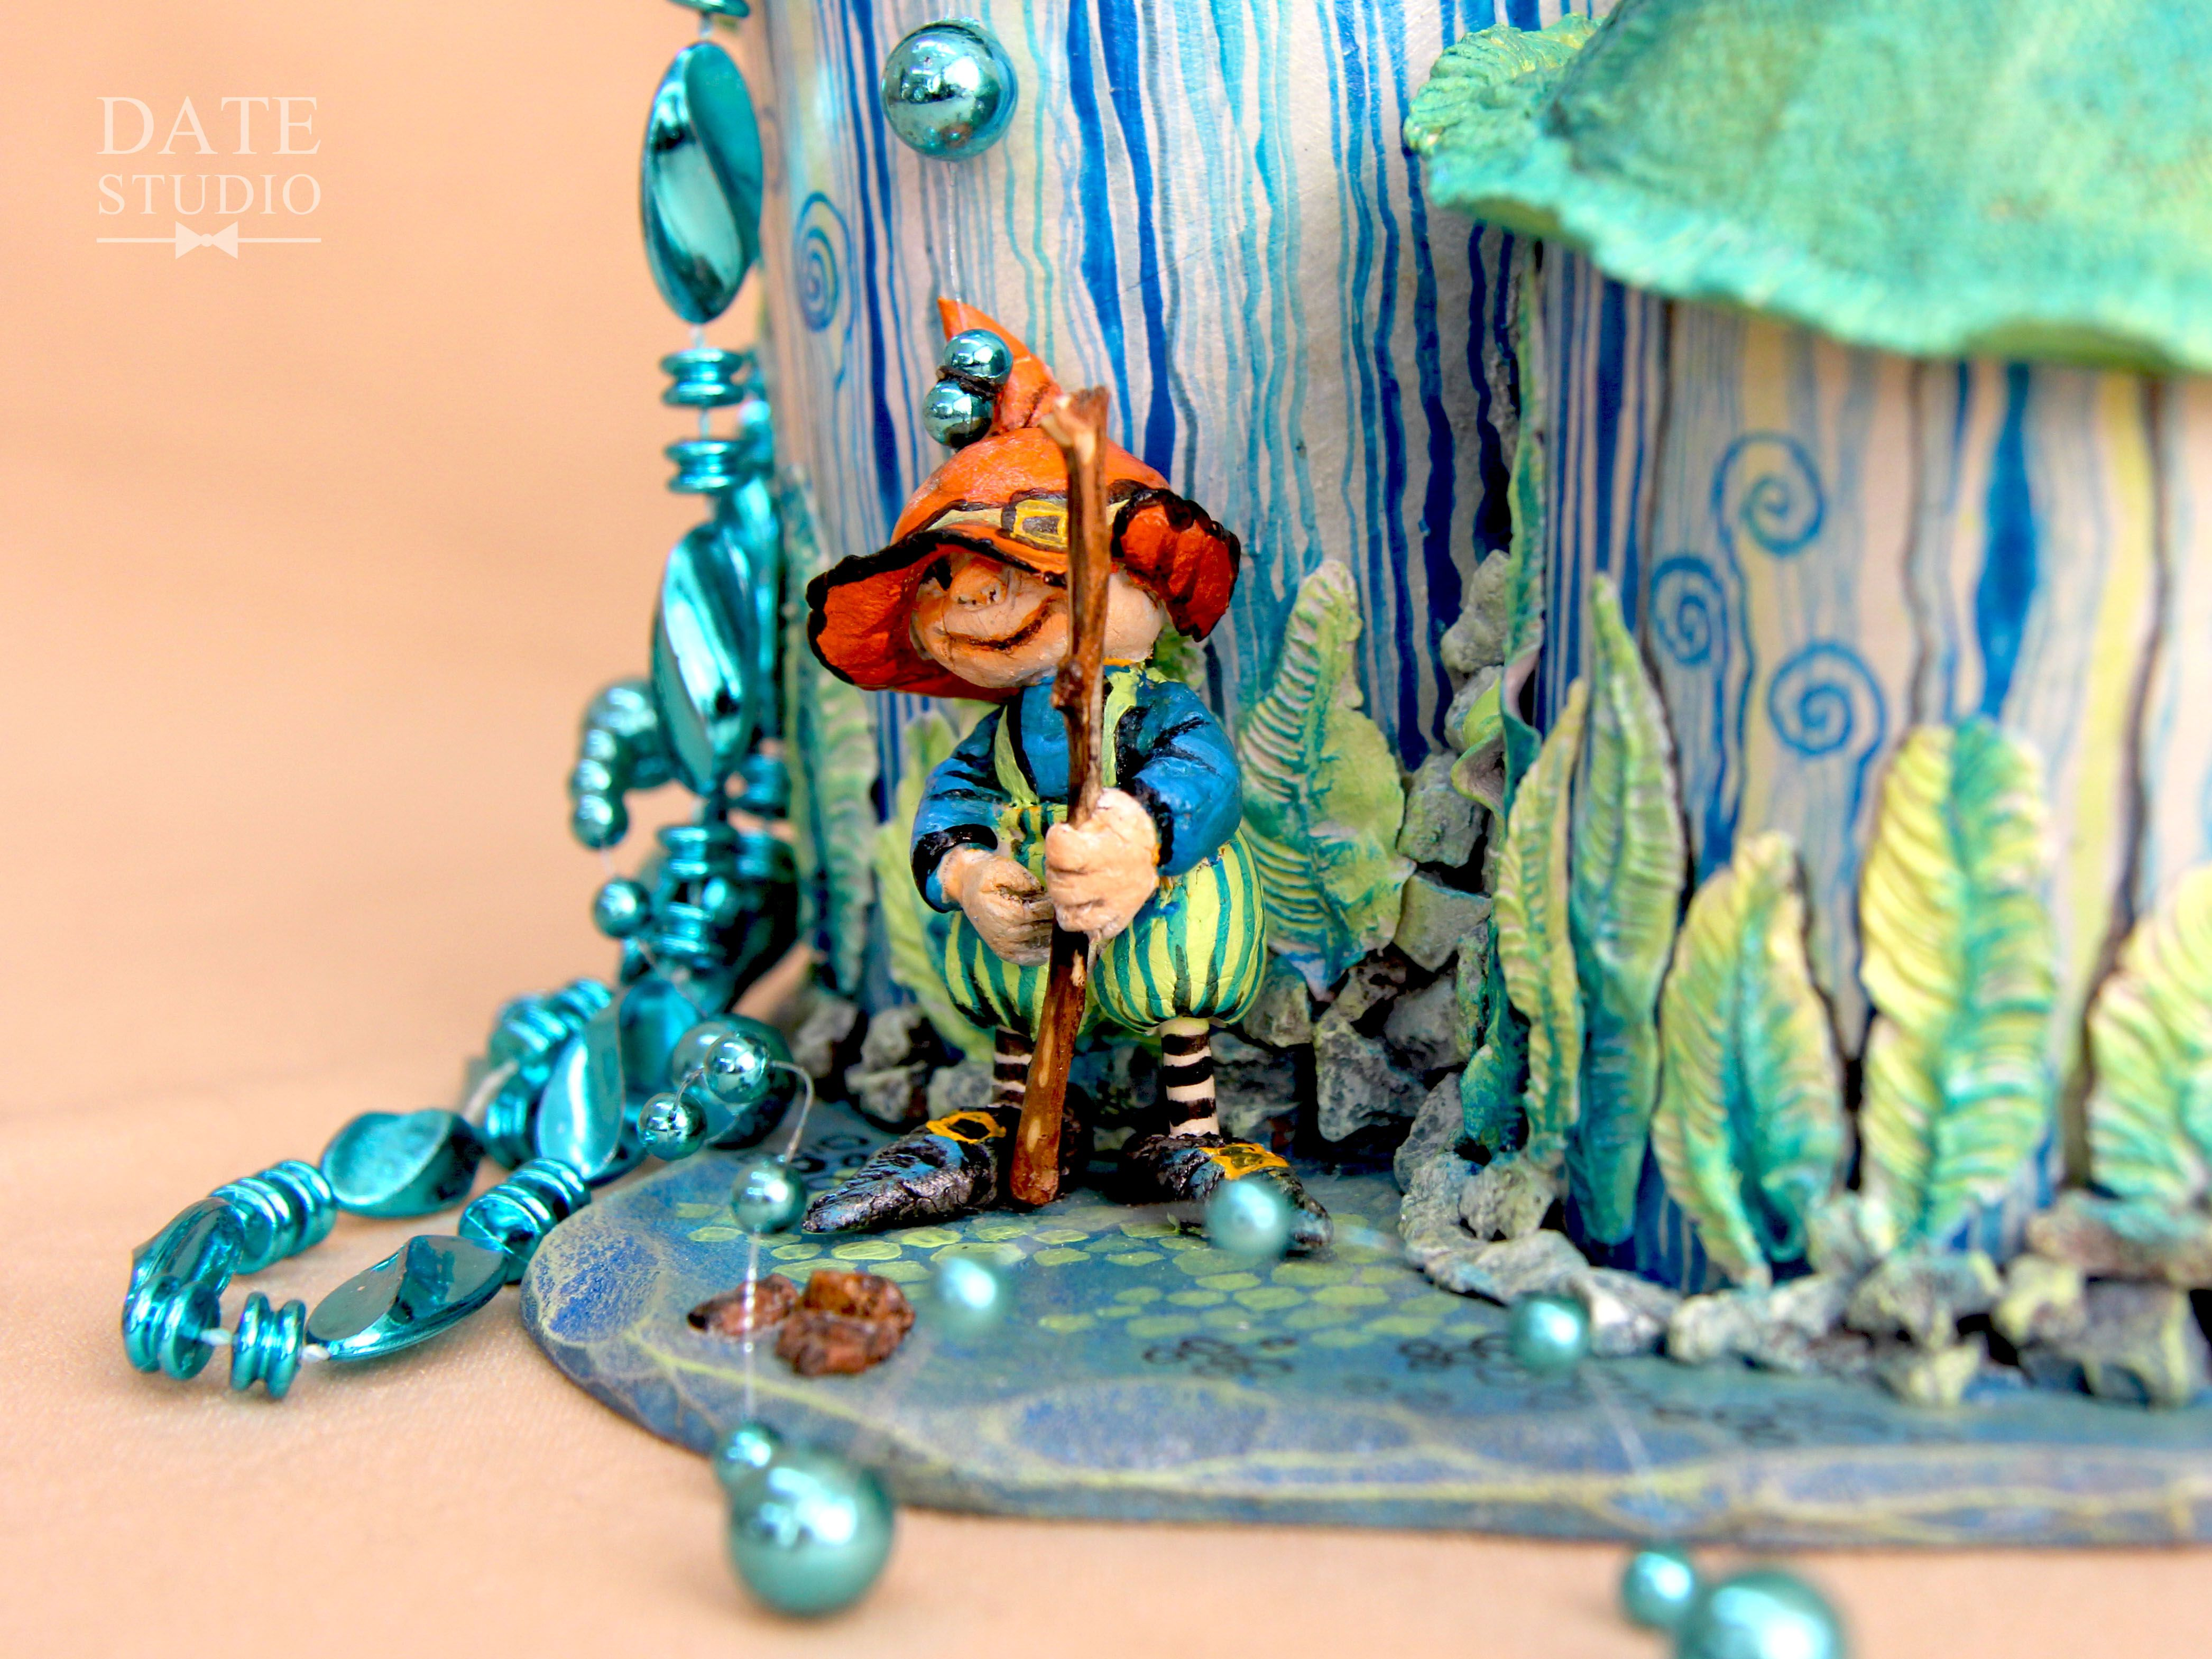 женщине подарок гномик декор интерьер шкатулка детали девушке бижутерия